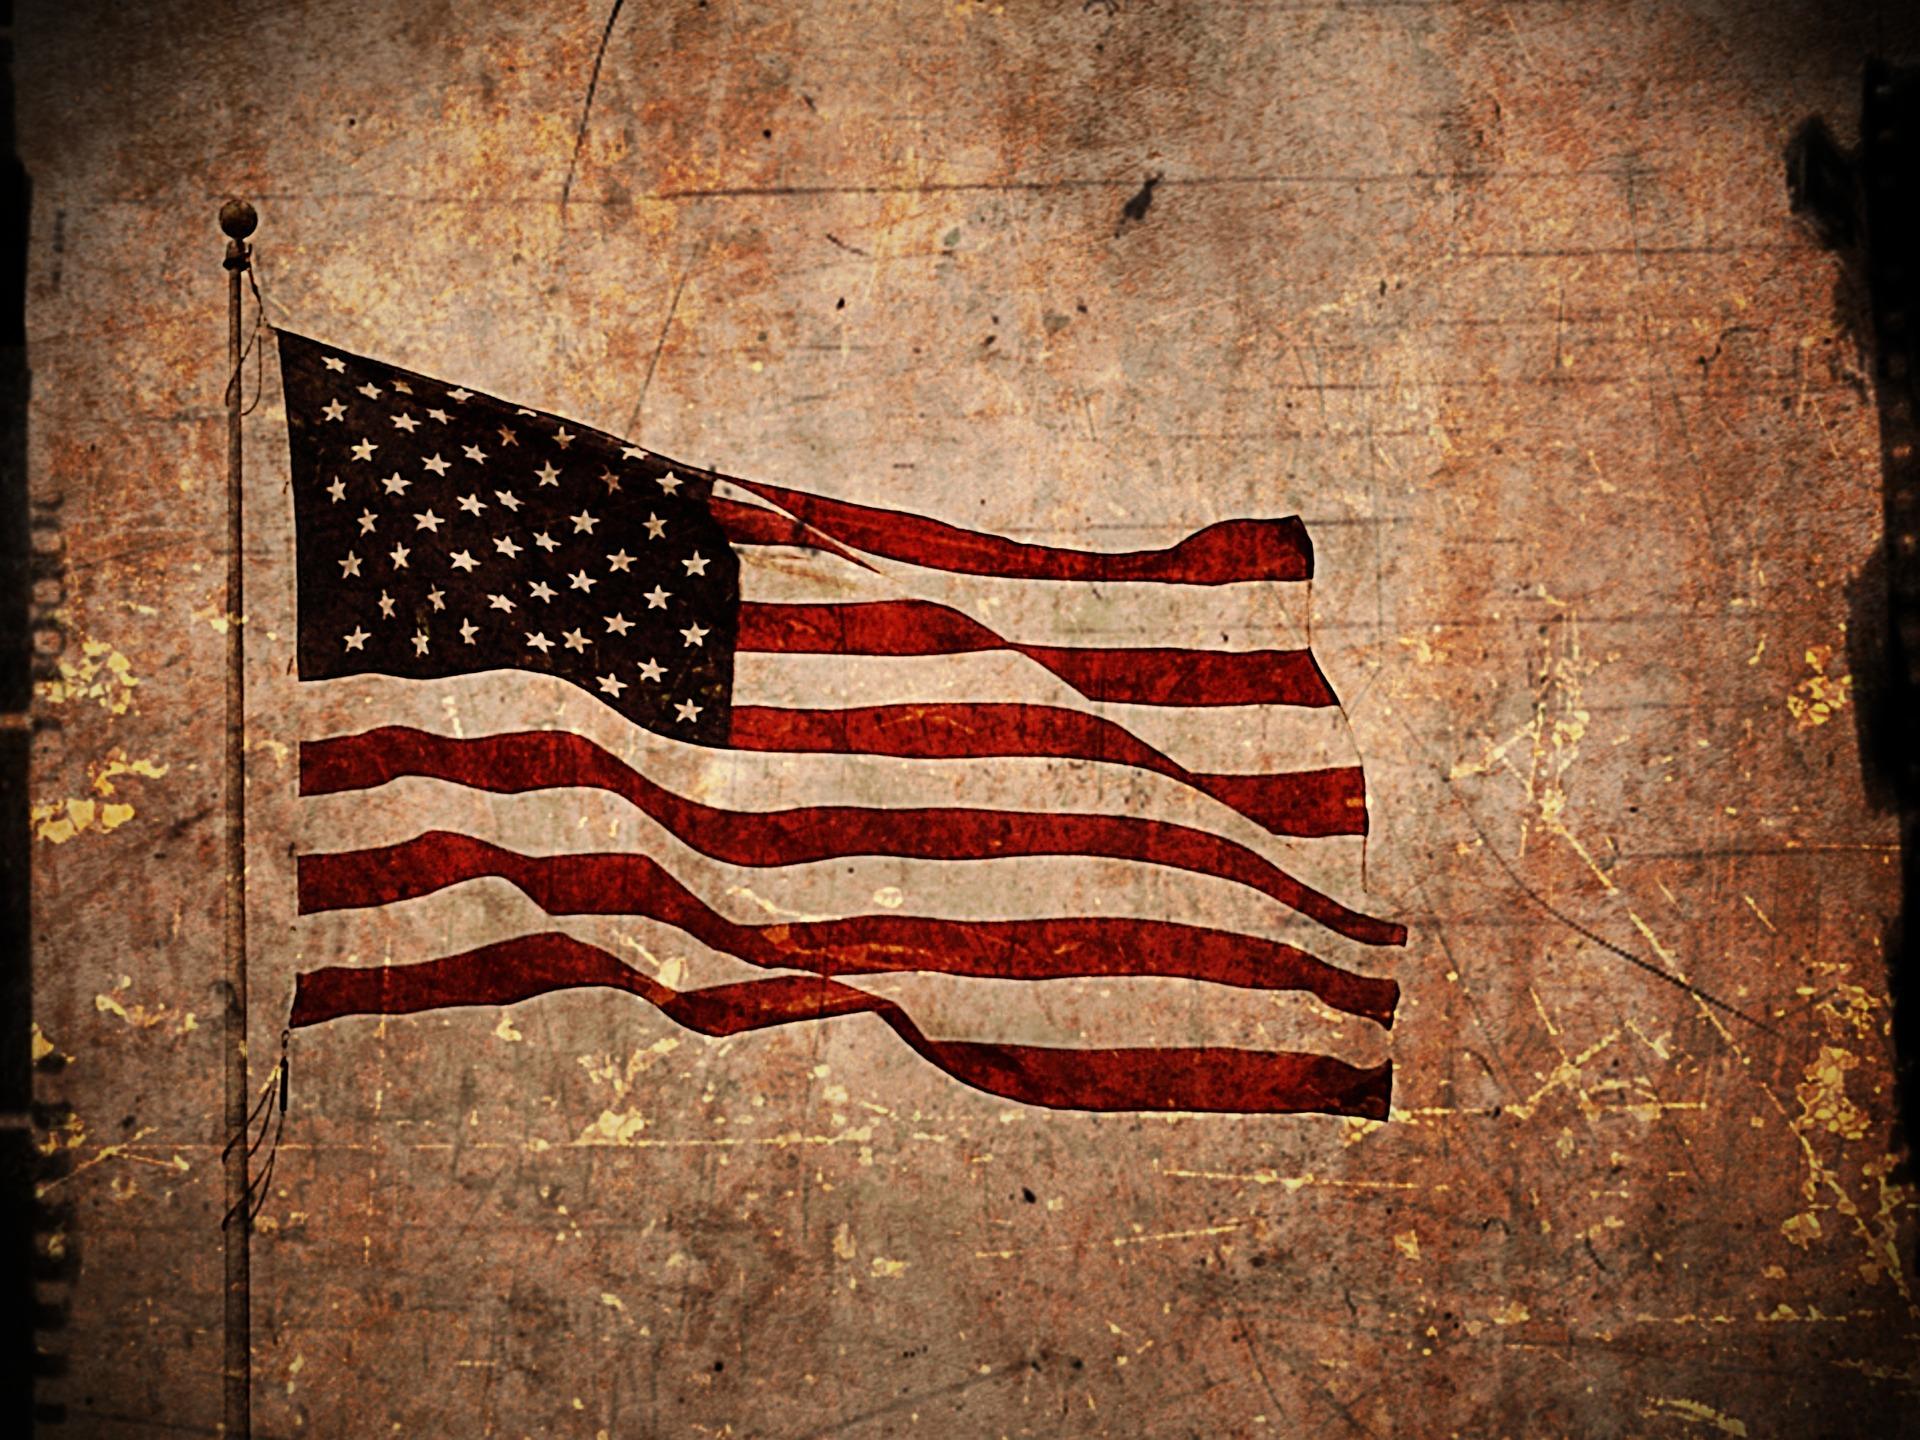 american-flag-795307_1920.jpg